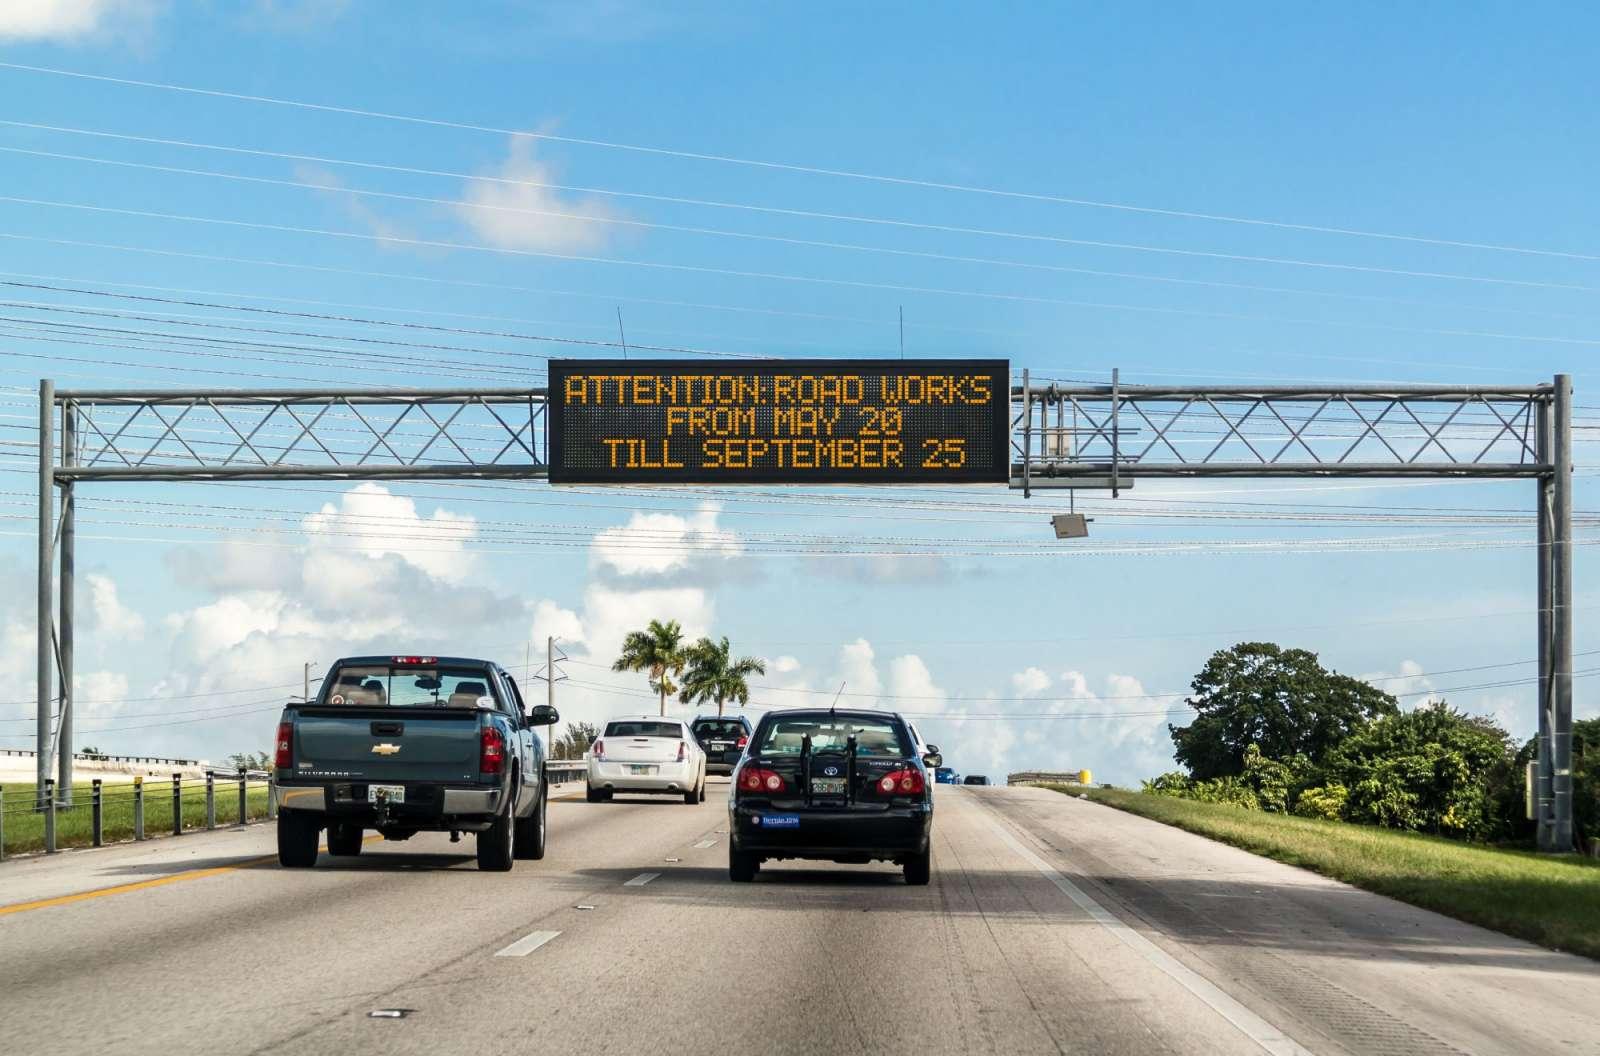 Traffic mgmt communication img1